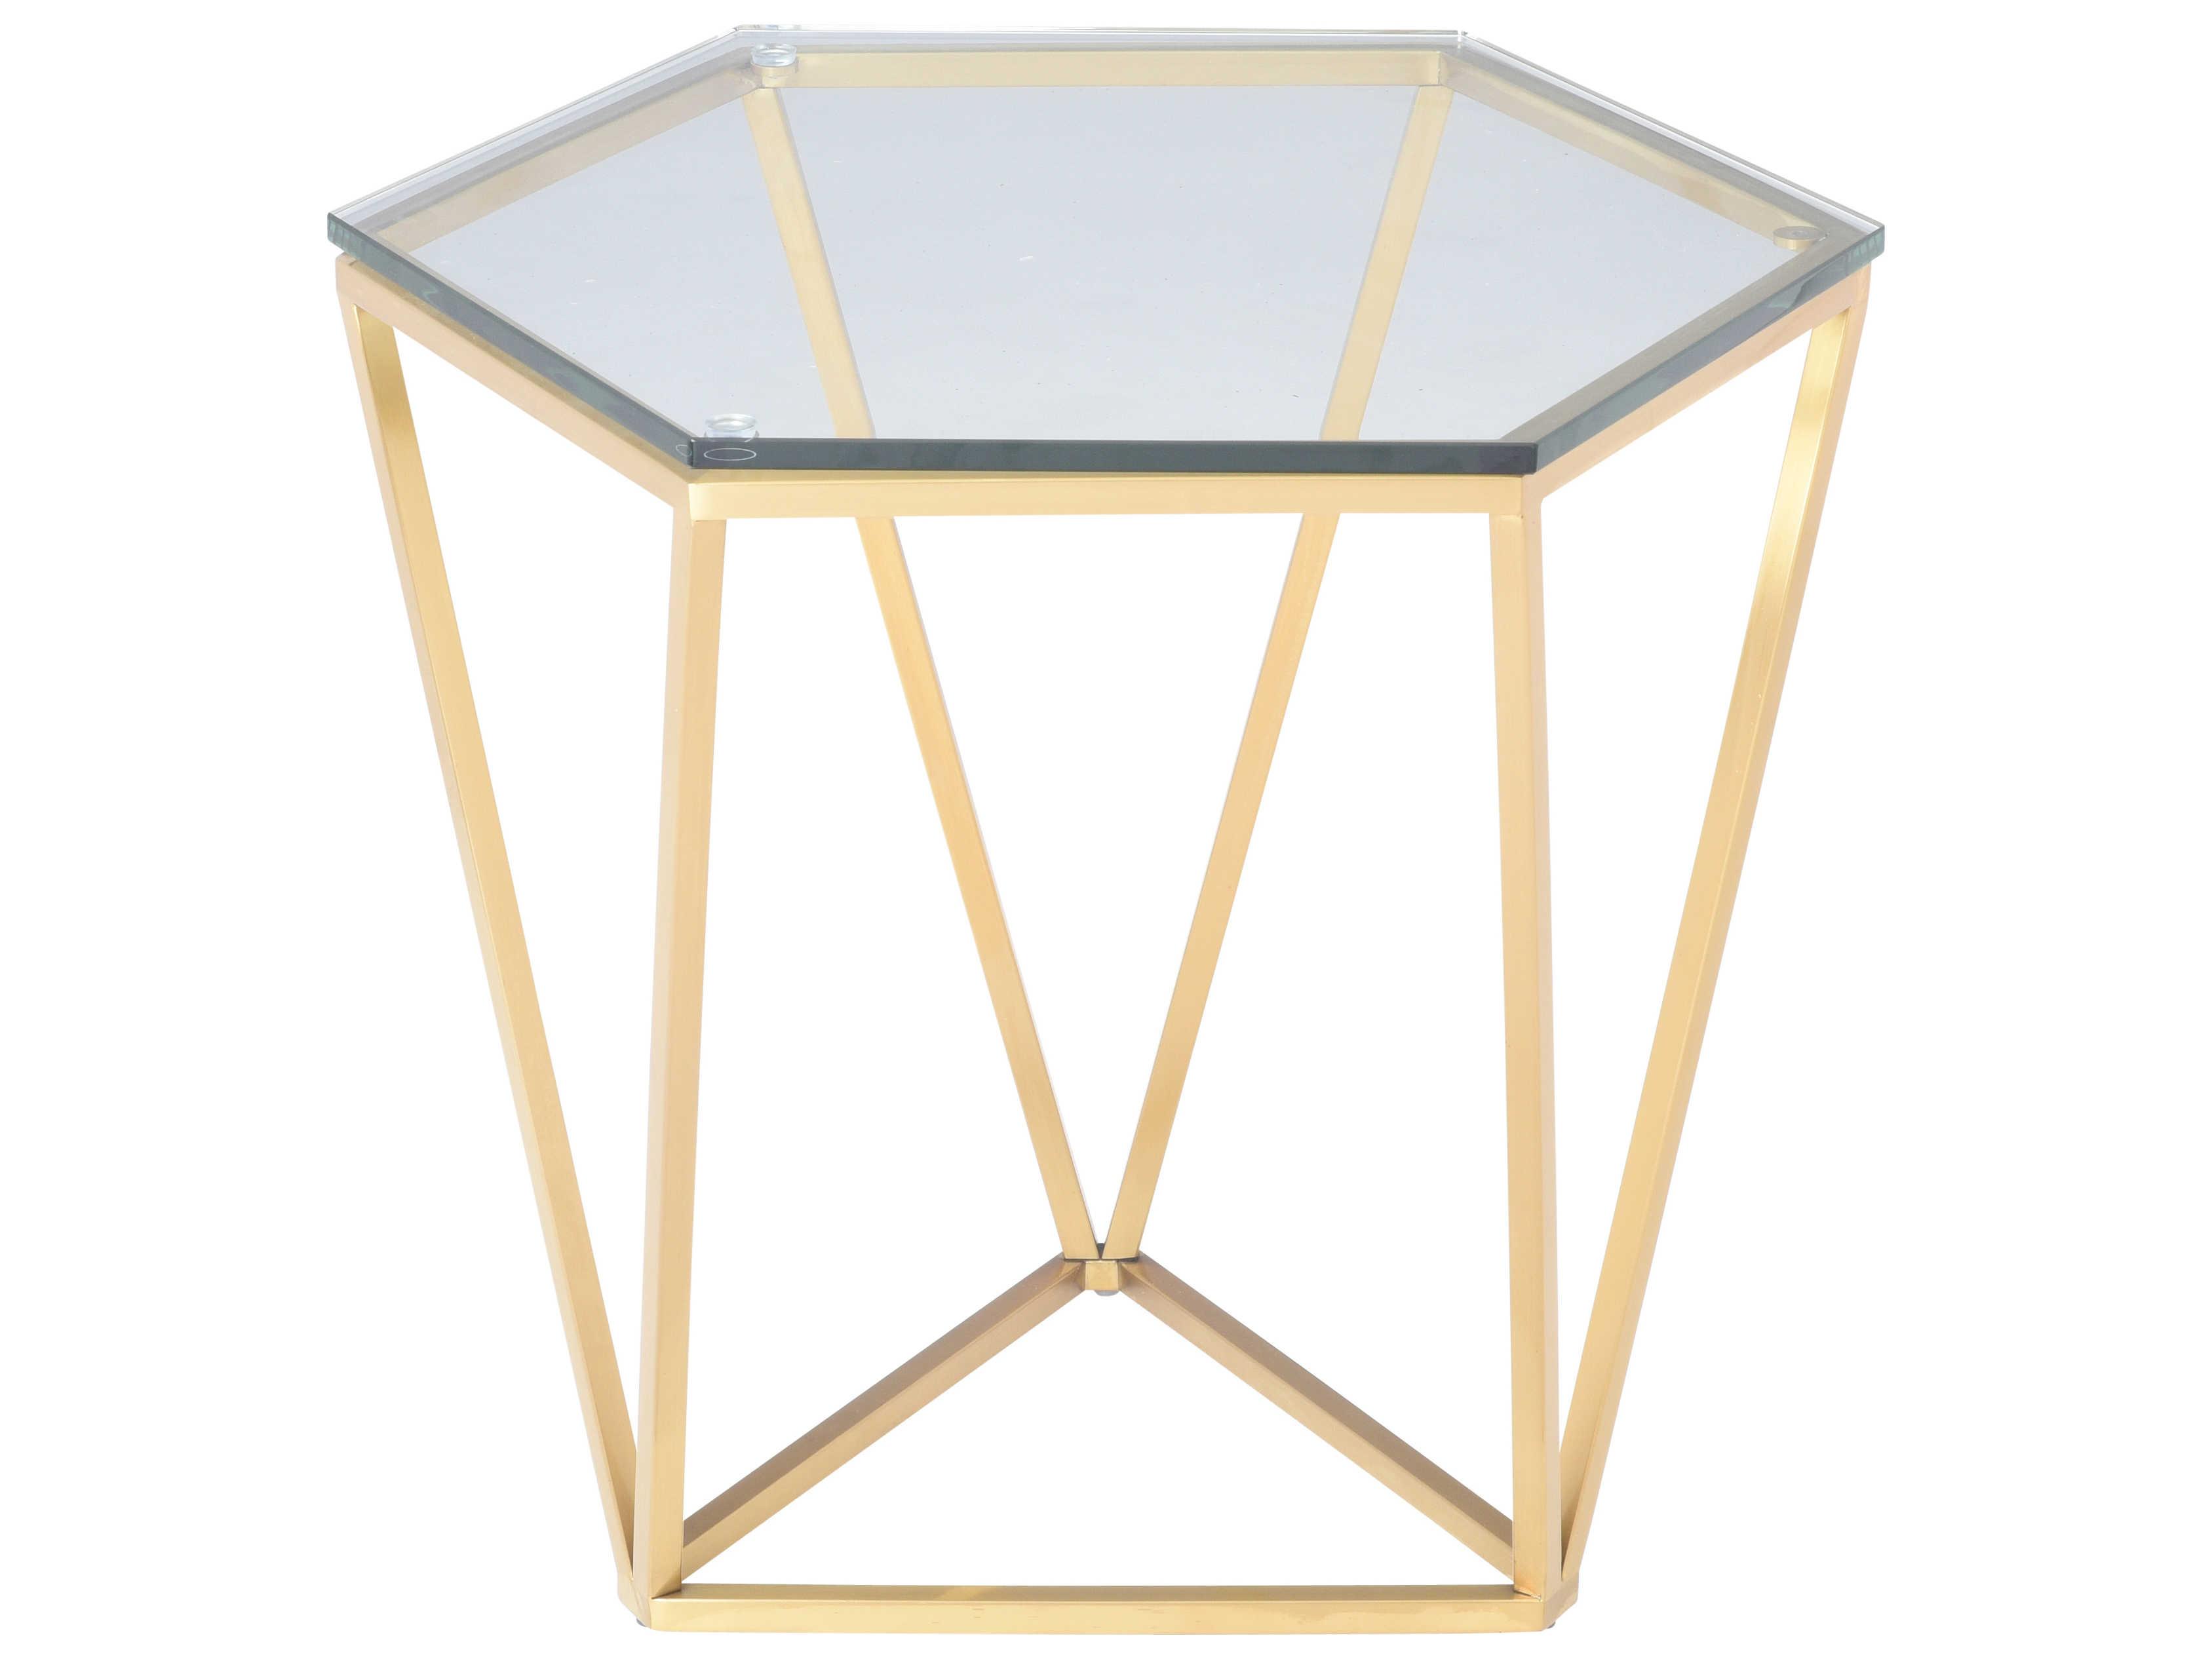 Brilliant Nuevo Living Louisa 23 5 X 20 5 Hexagonal Drum Table Andrewgaddart Wooden Chair Designs For Living Room Andrewgaddartcom